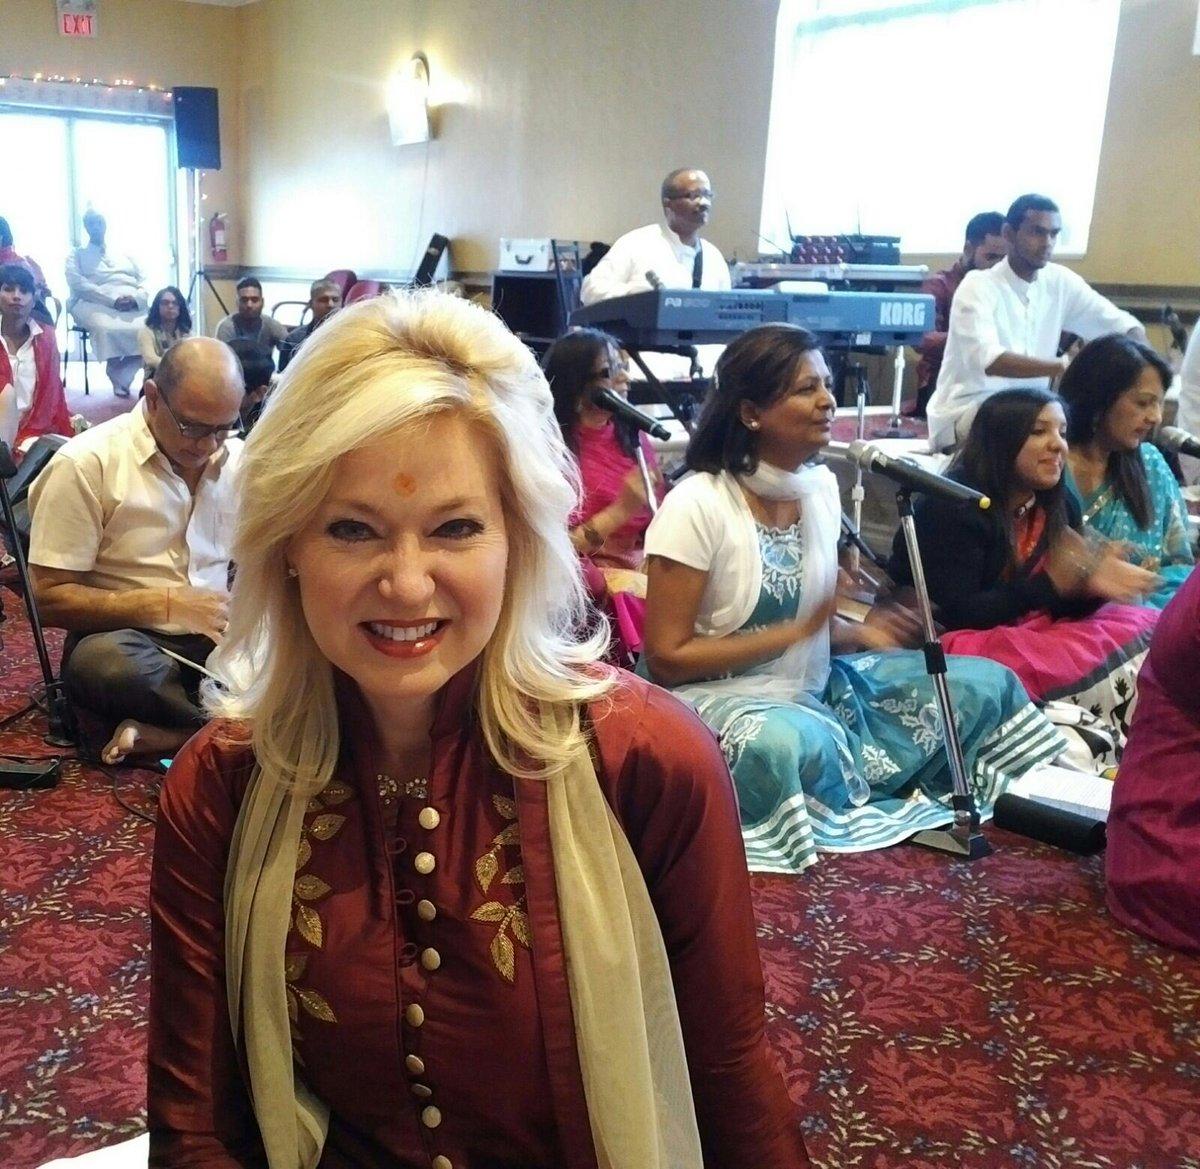 Abdalah Castillo On Twitter Great Shot Very Elegant With The Sari